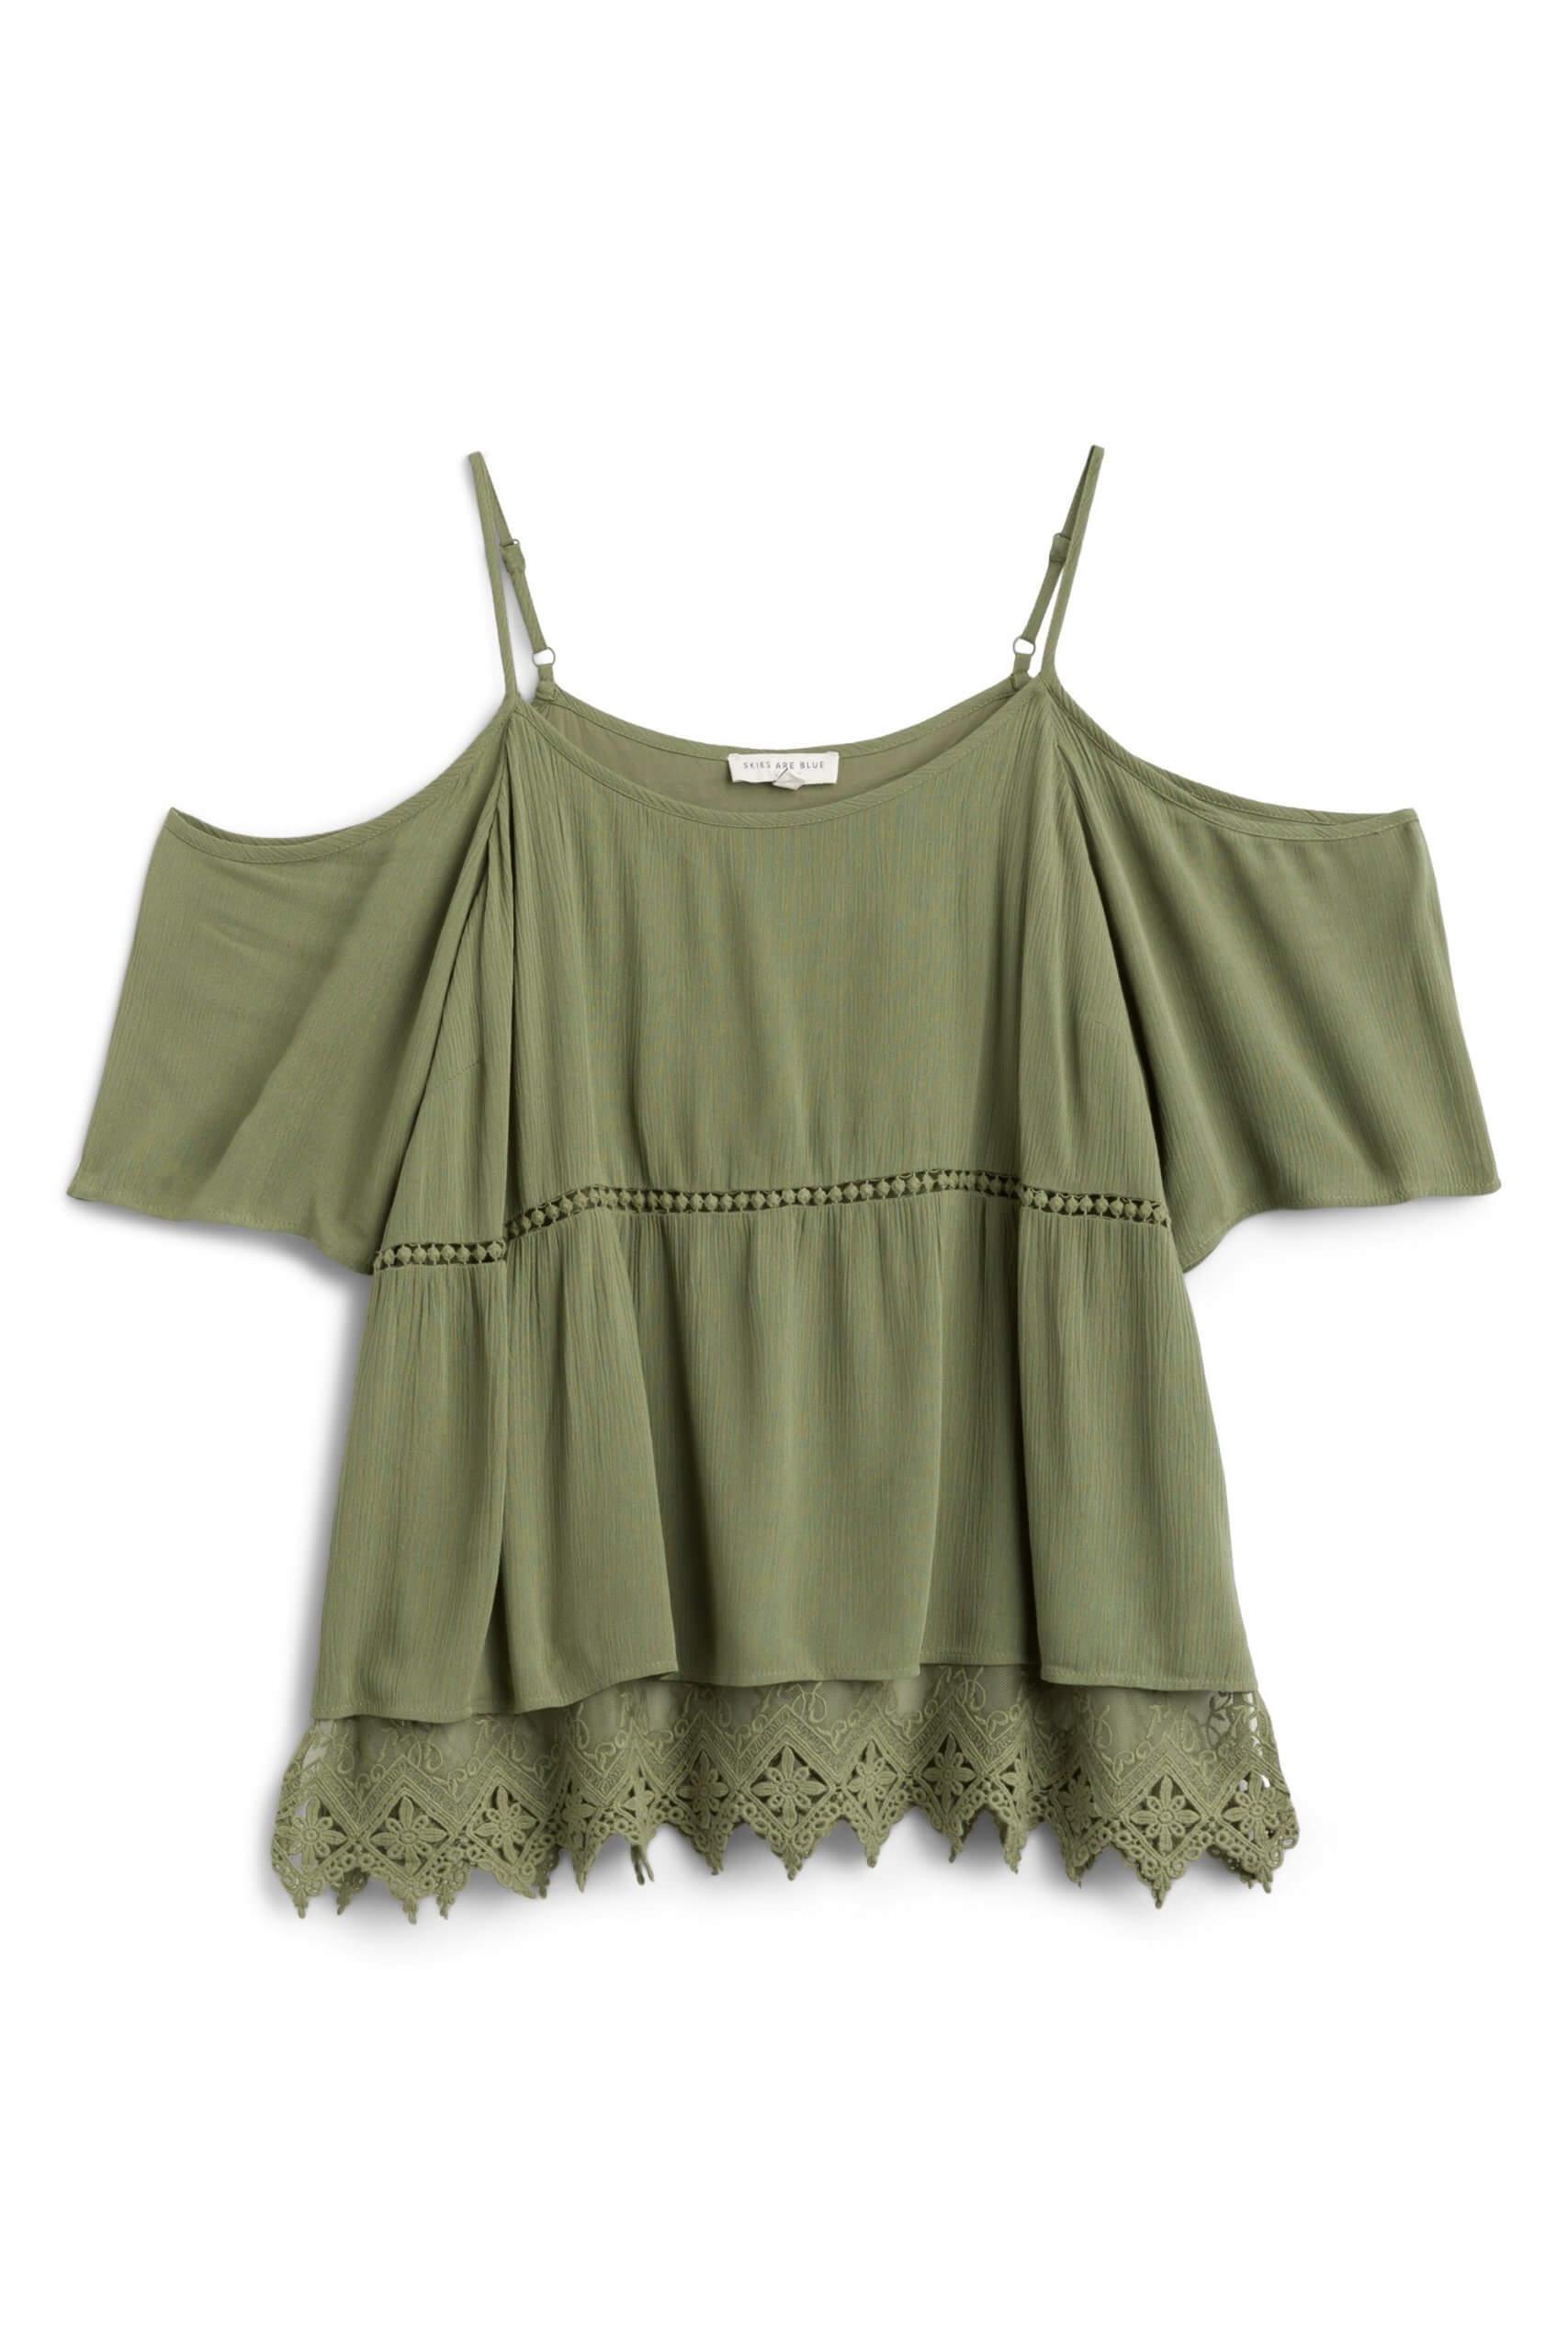 Stitch Fix Women's olive green cold shoulder top.